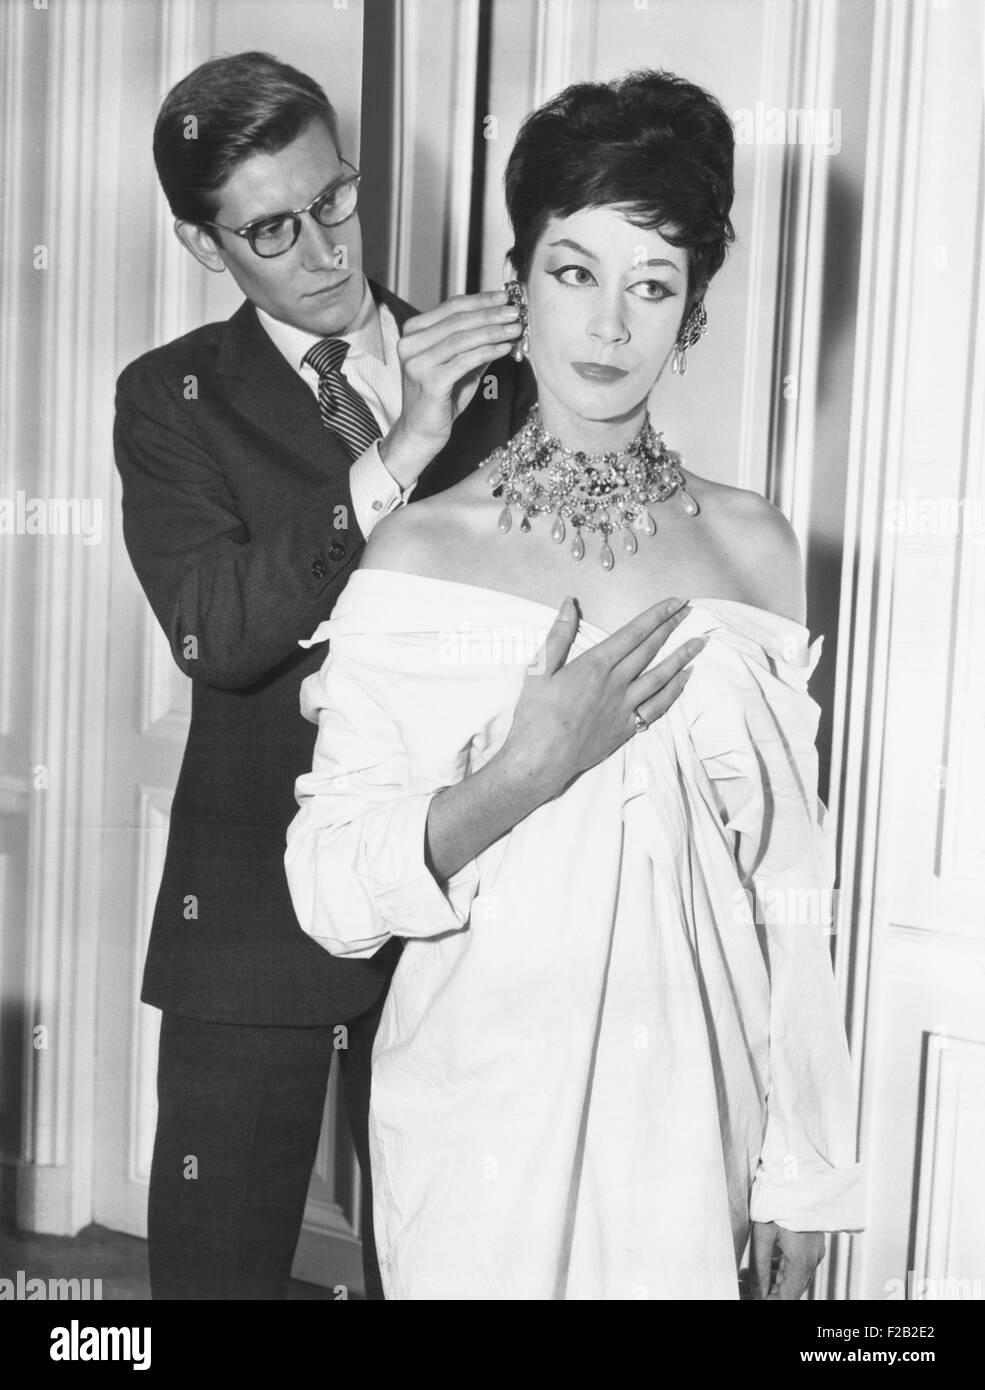 Französischer Modeschöpfer Yves Saint Laurent Modell Zipfelbildung aufsetzen. 18. Januar 1962. (CSU_2015 Stockbild